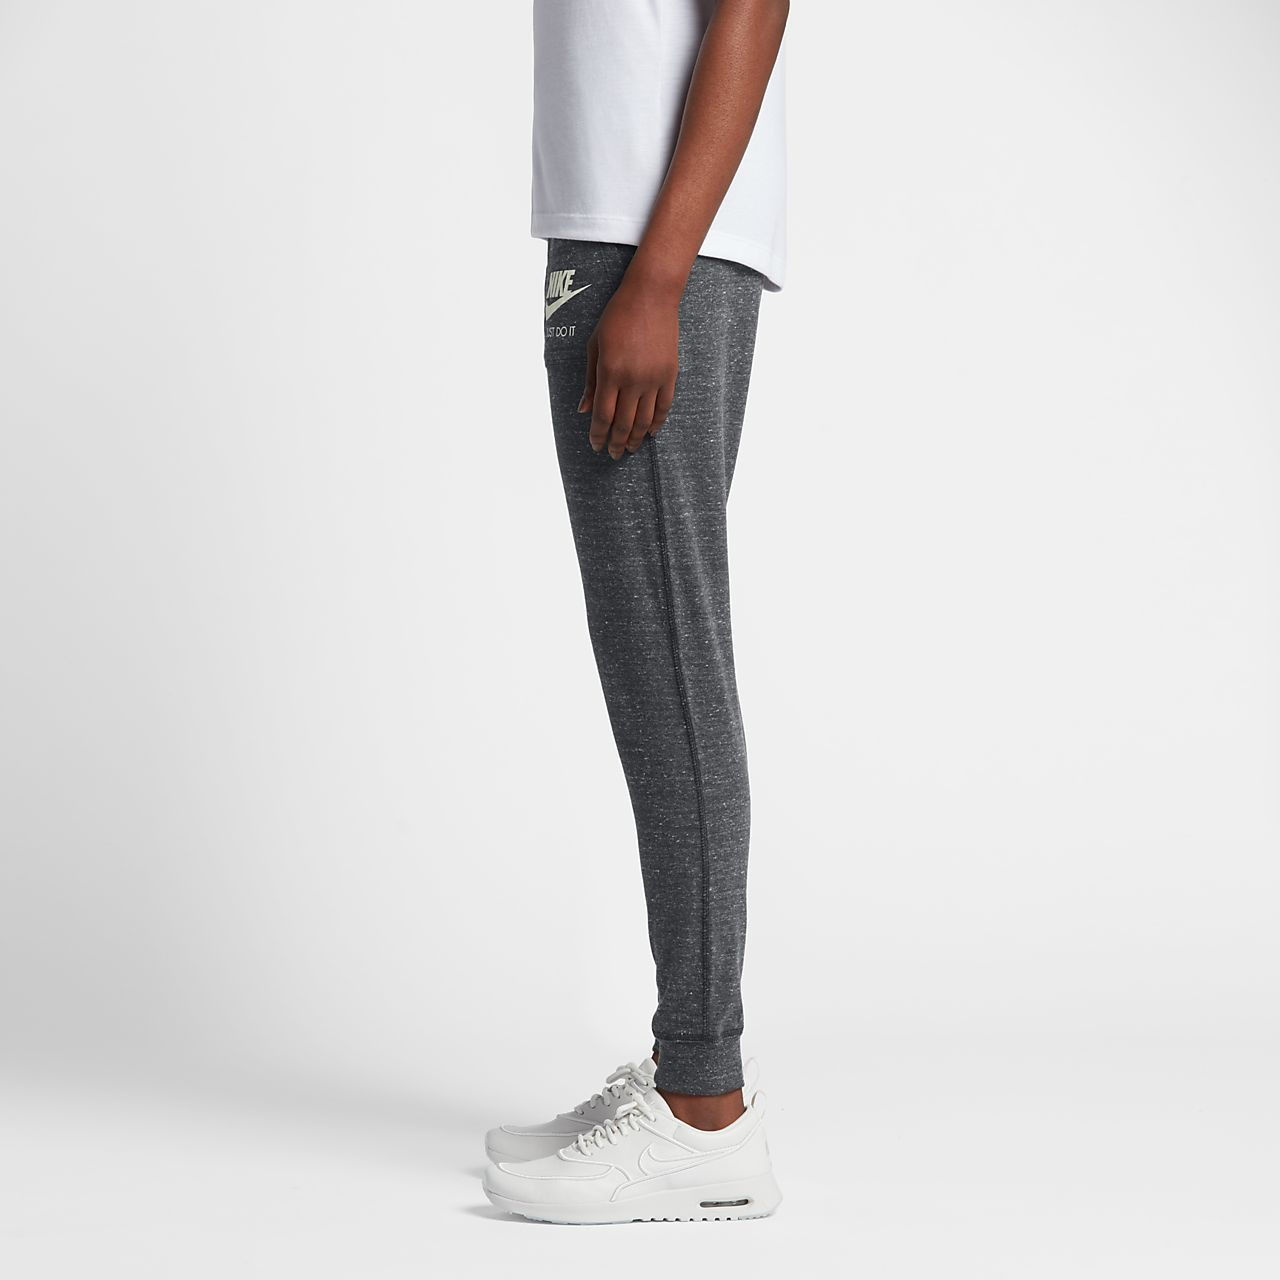 pantaloni nike ragazza 2017